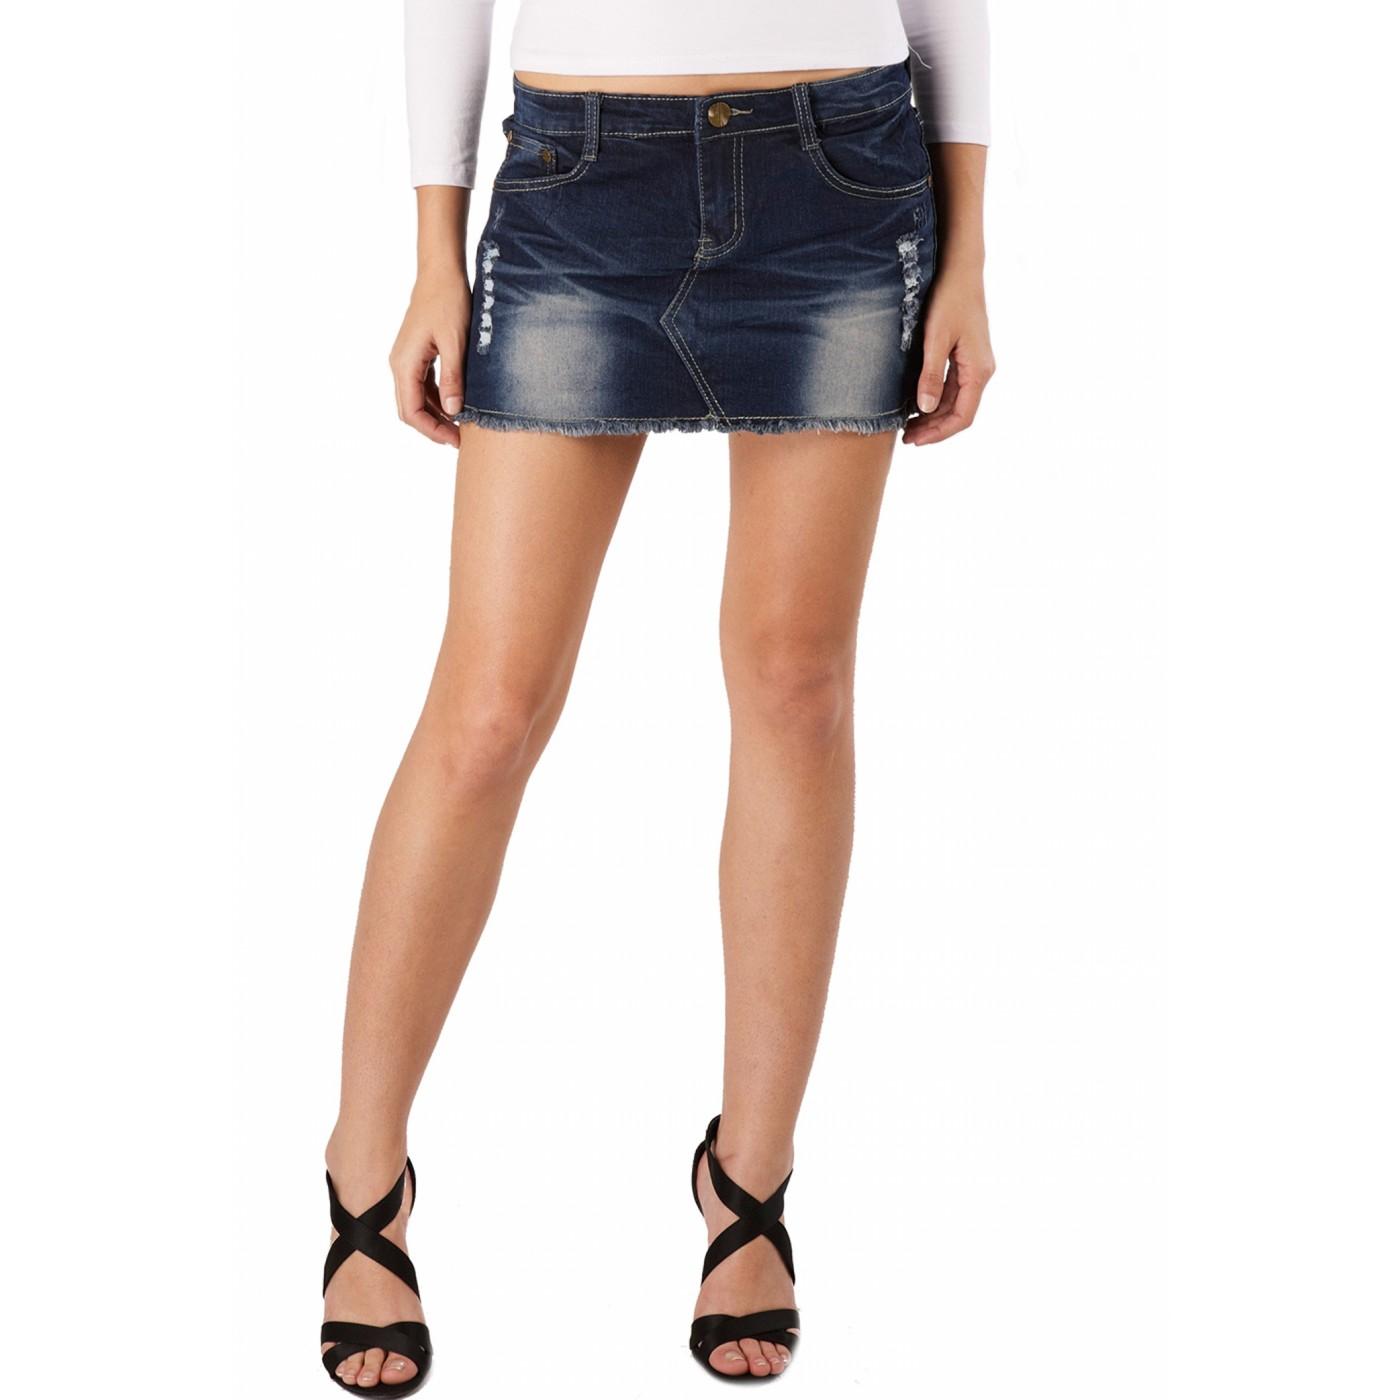 Luxury Lane Jessie G Womens Low Rise Distressed Denim Mini Skirt